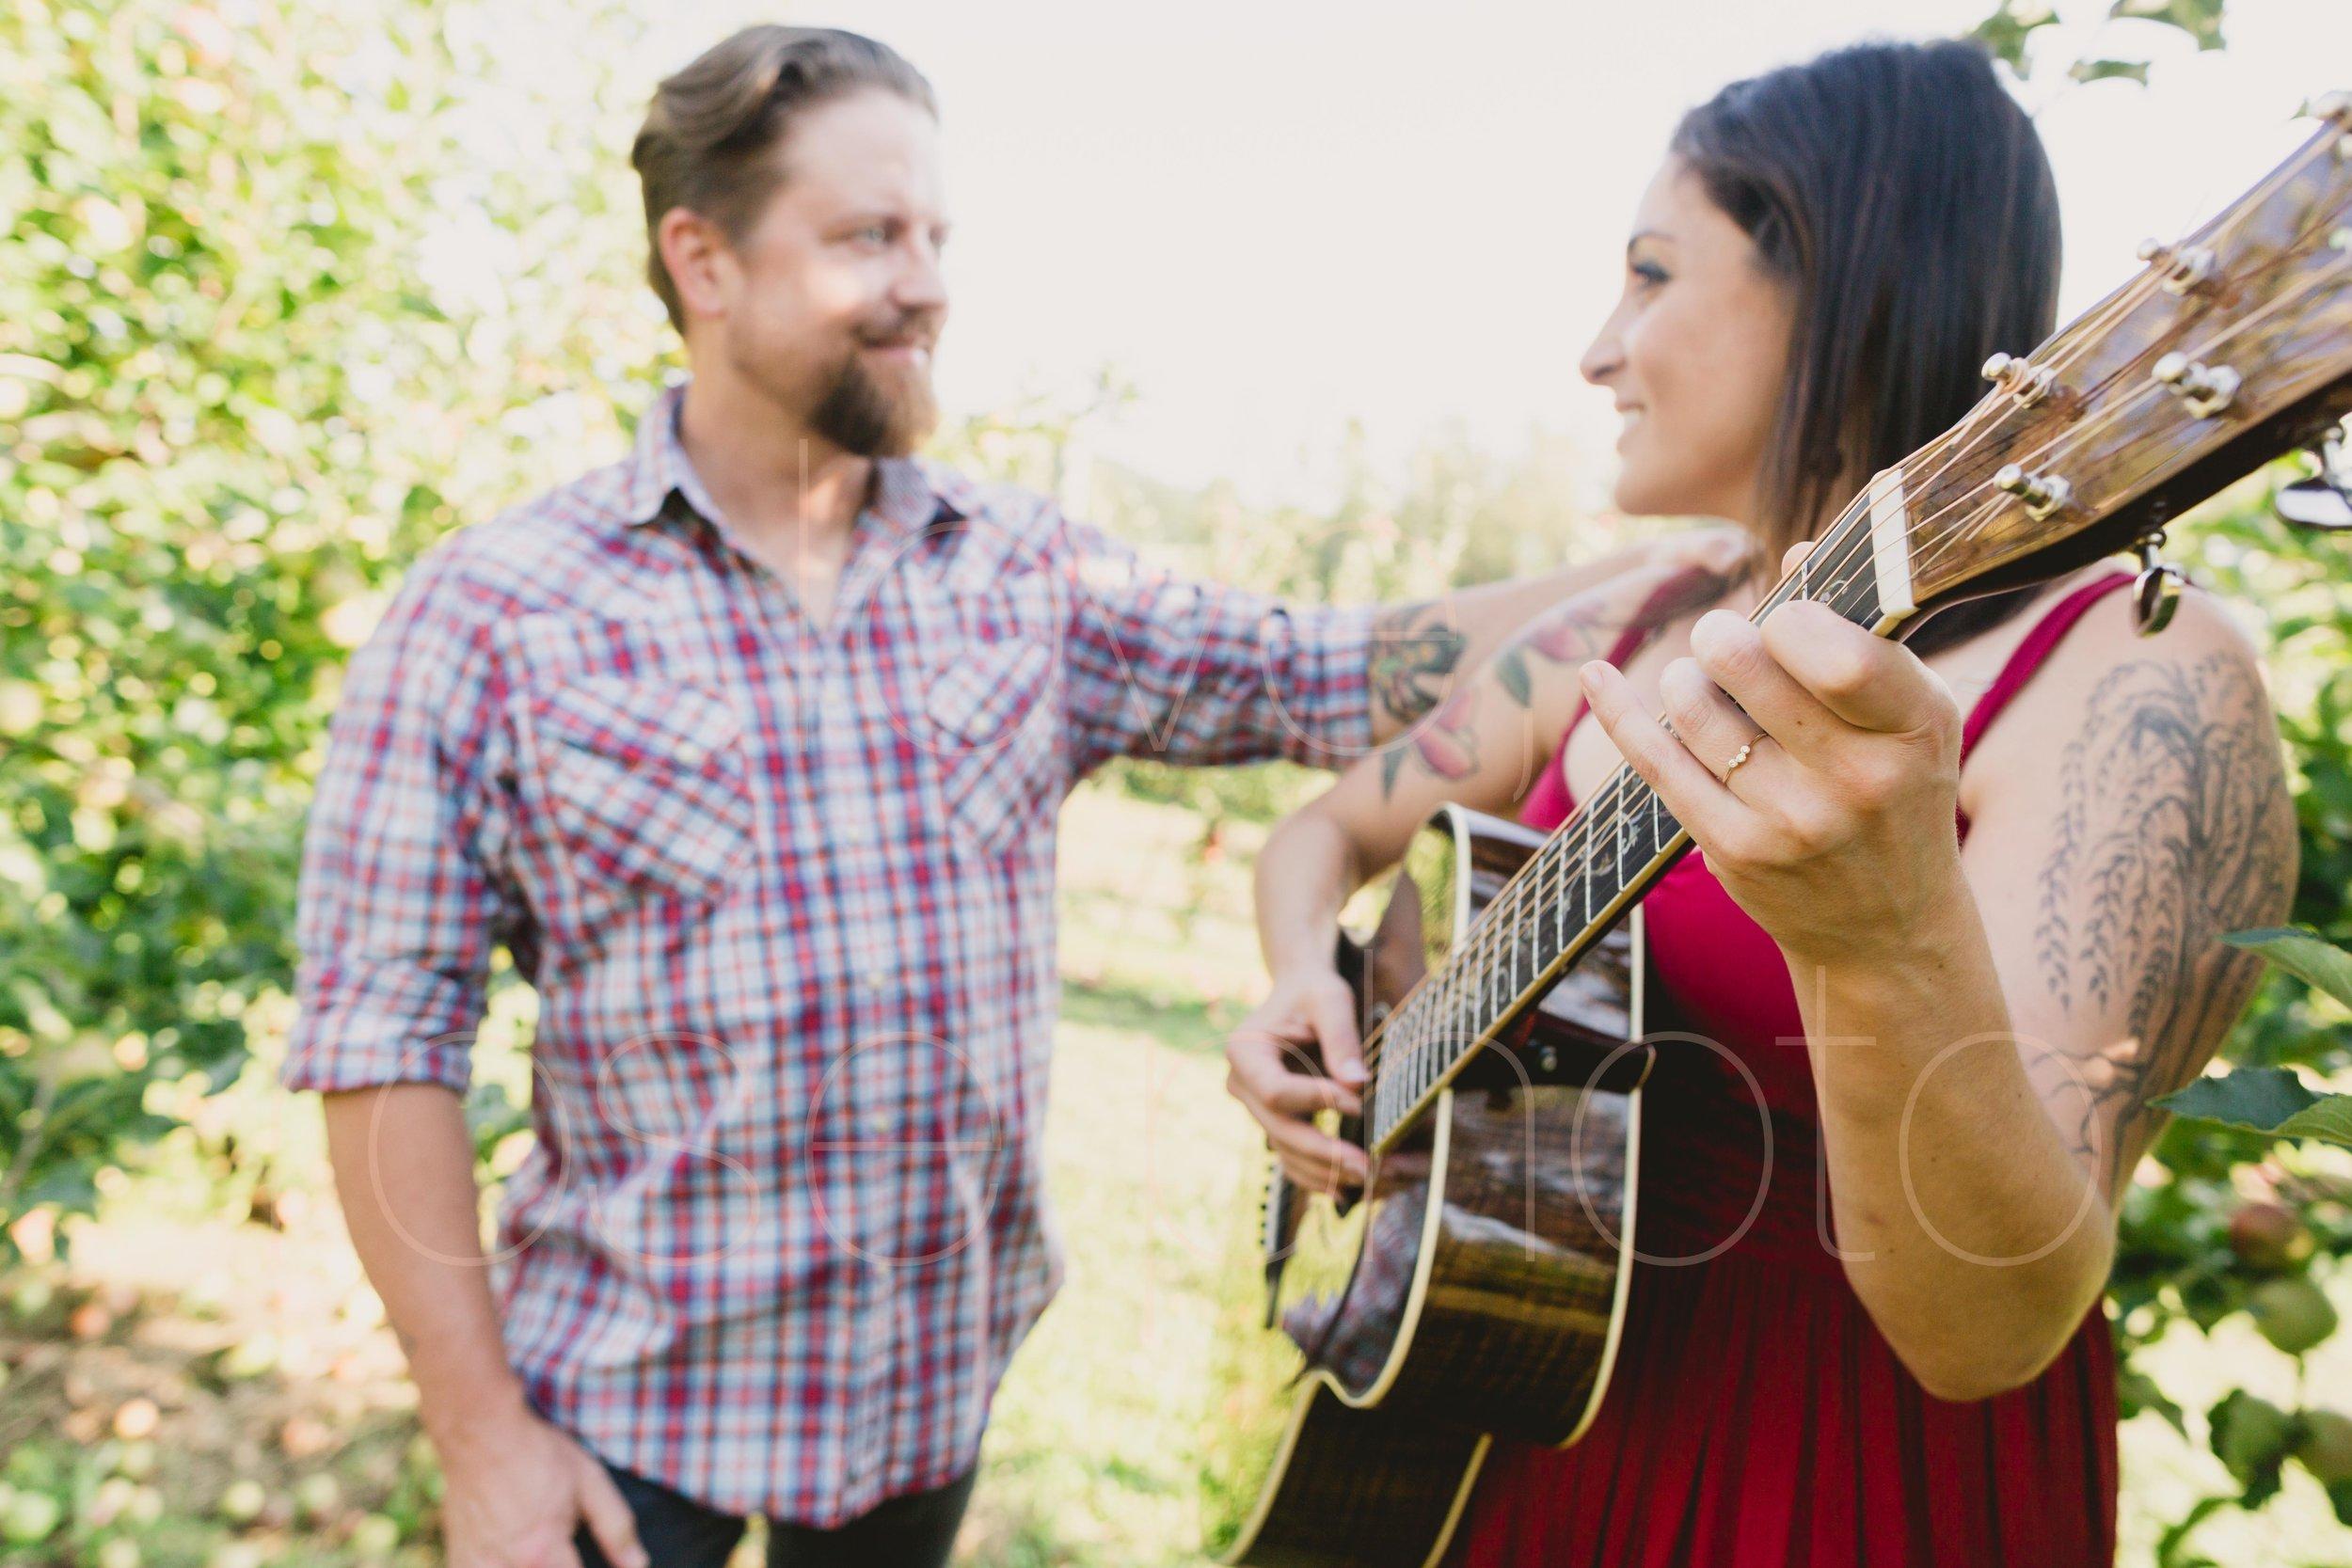 Jane Kramer Ashevegas Jason Sanford WNC Asheville wedding engagement shoot by Rose Photo-15.jpg